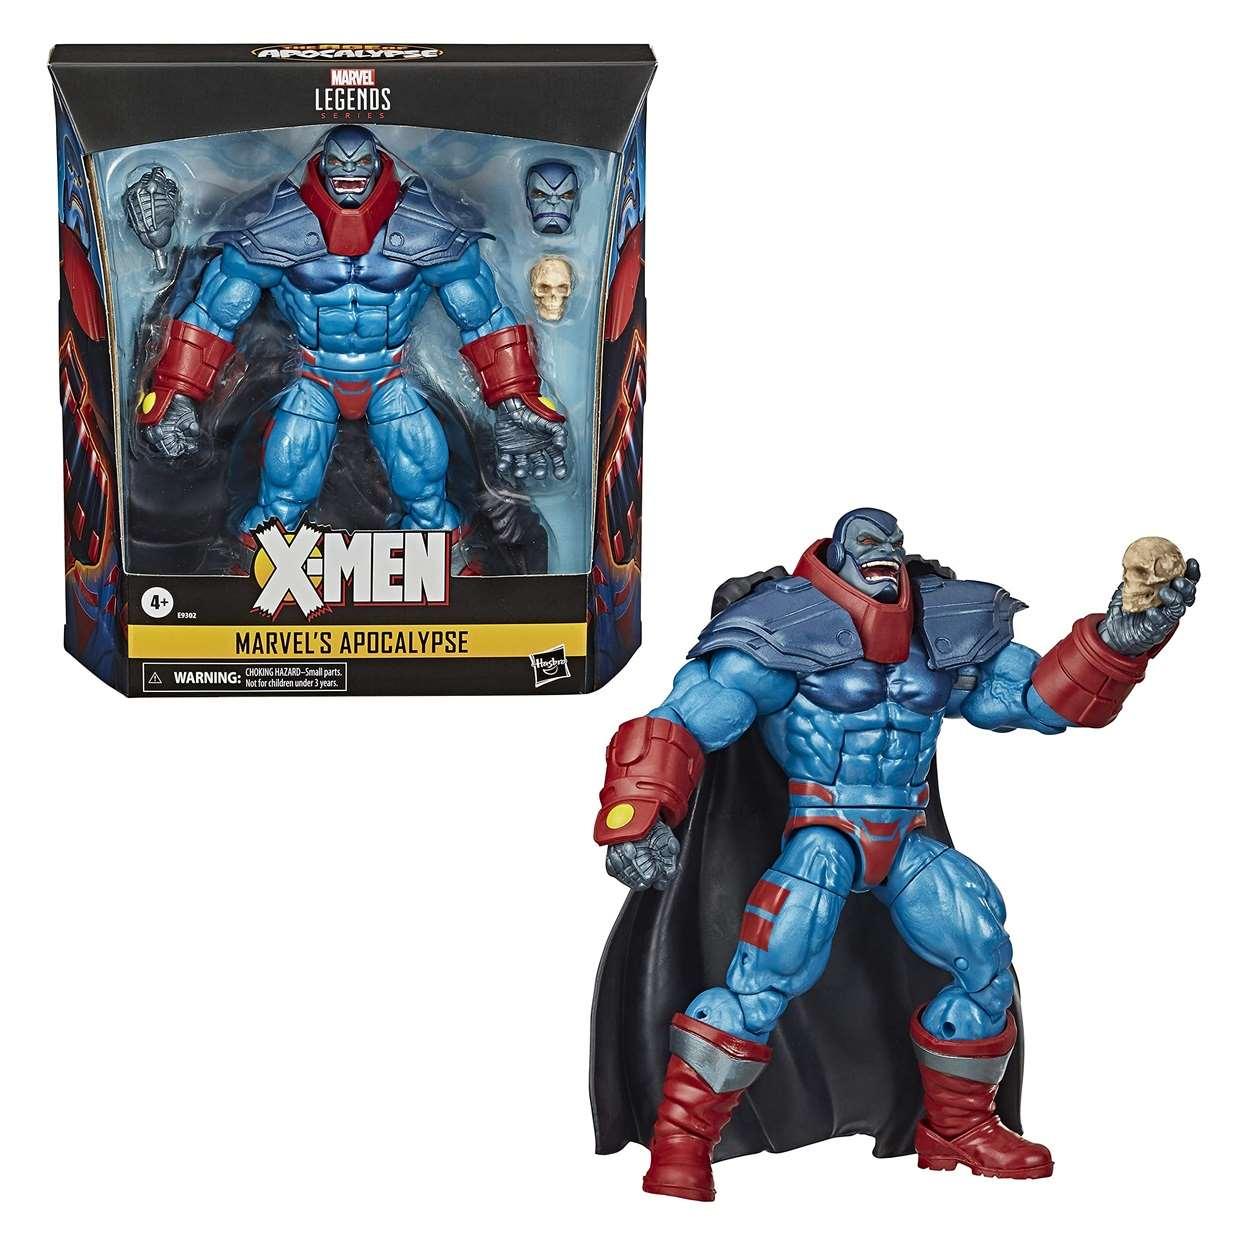 Apocalypse Figura Marvel X Men Legends Series 7 Pulgadas